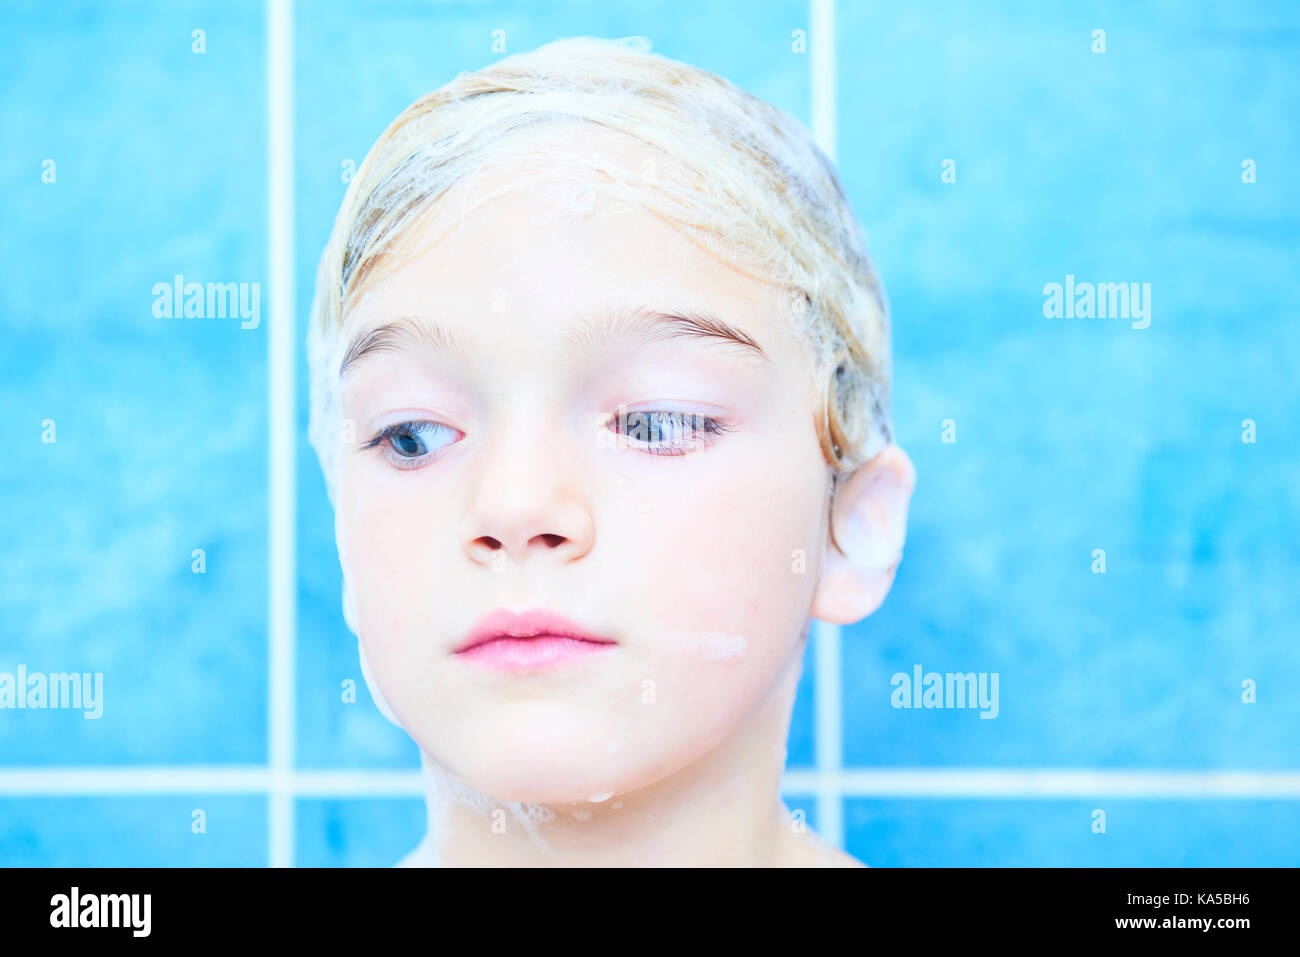 Little Girl Taking Bath Stock Photos & Little Girl Taking Bath Stock ...